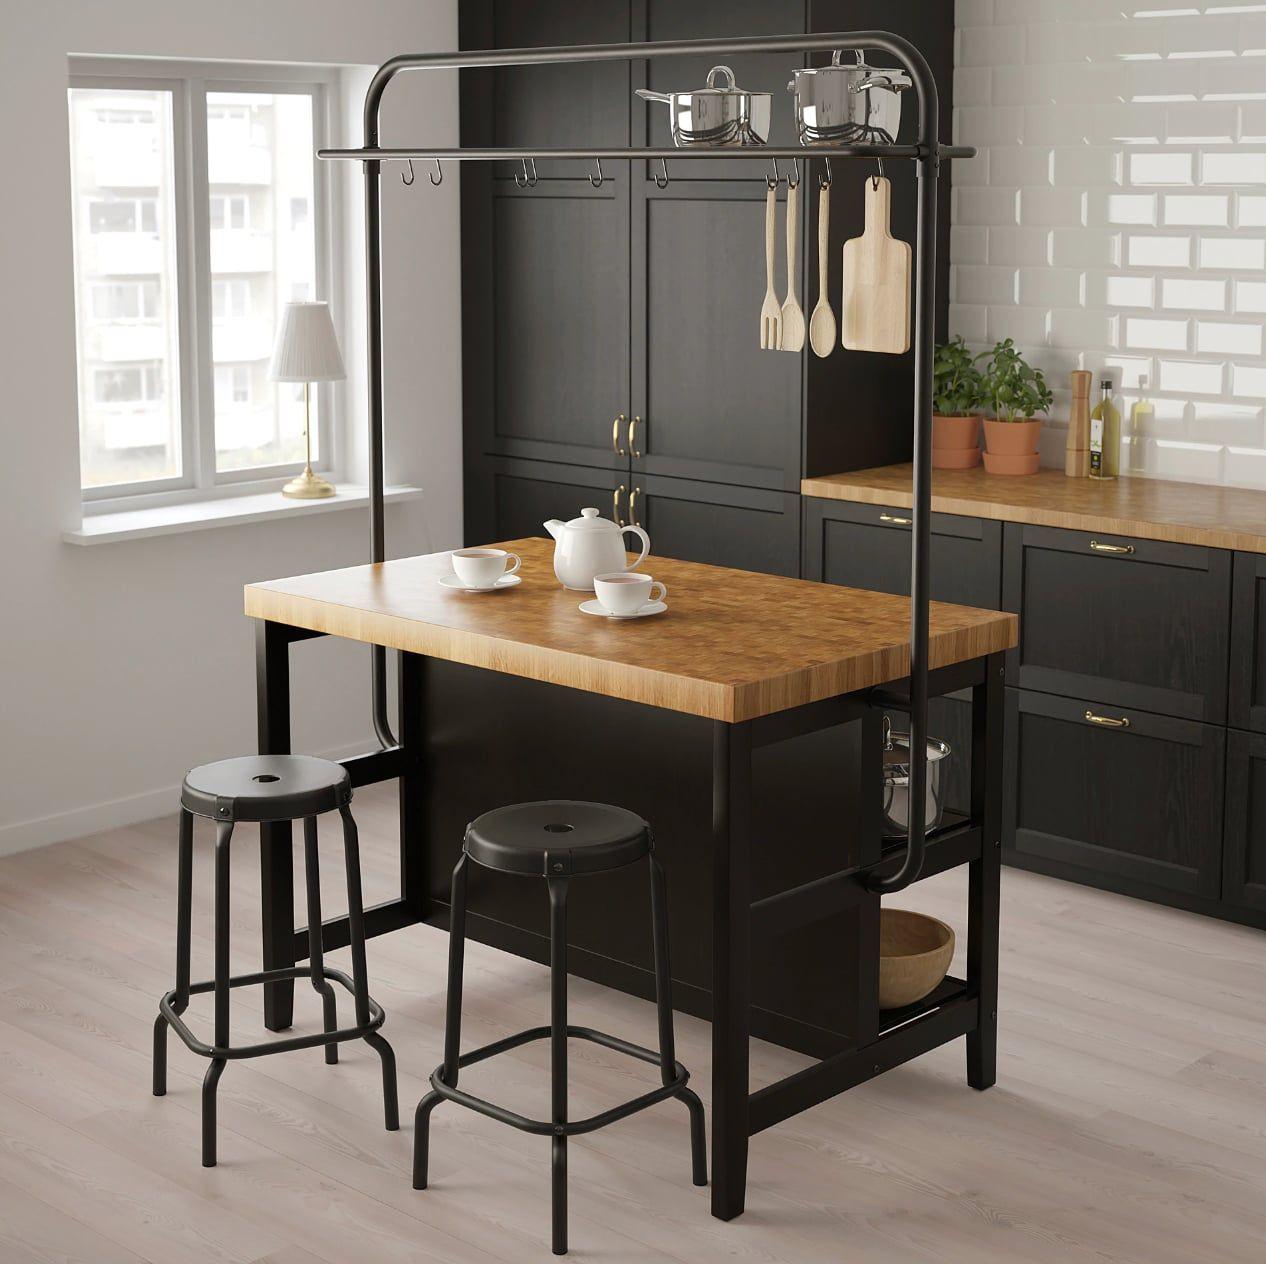 Vadholma Kitchen Island With Rack Kitchen Furniture Freestanding Kitchen Island Ikea Kitchen